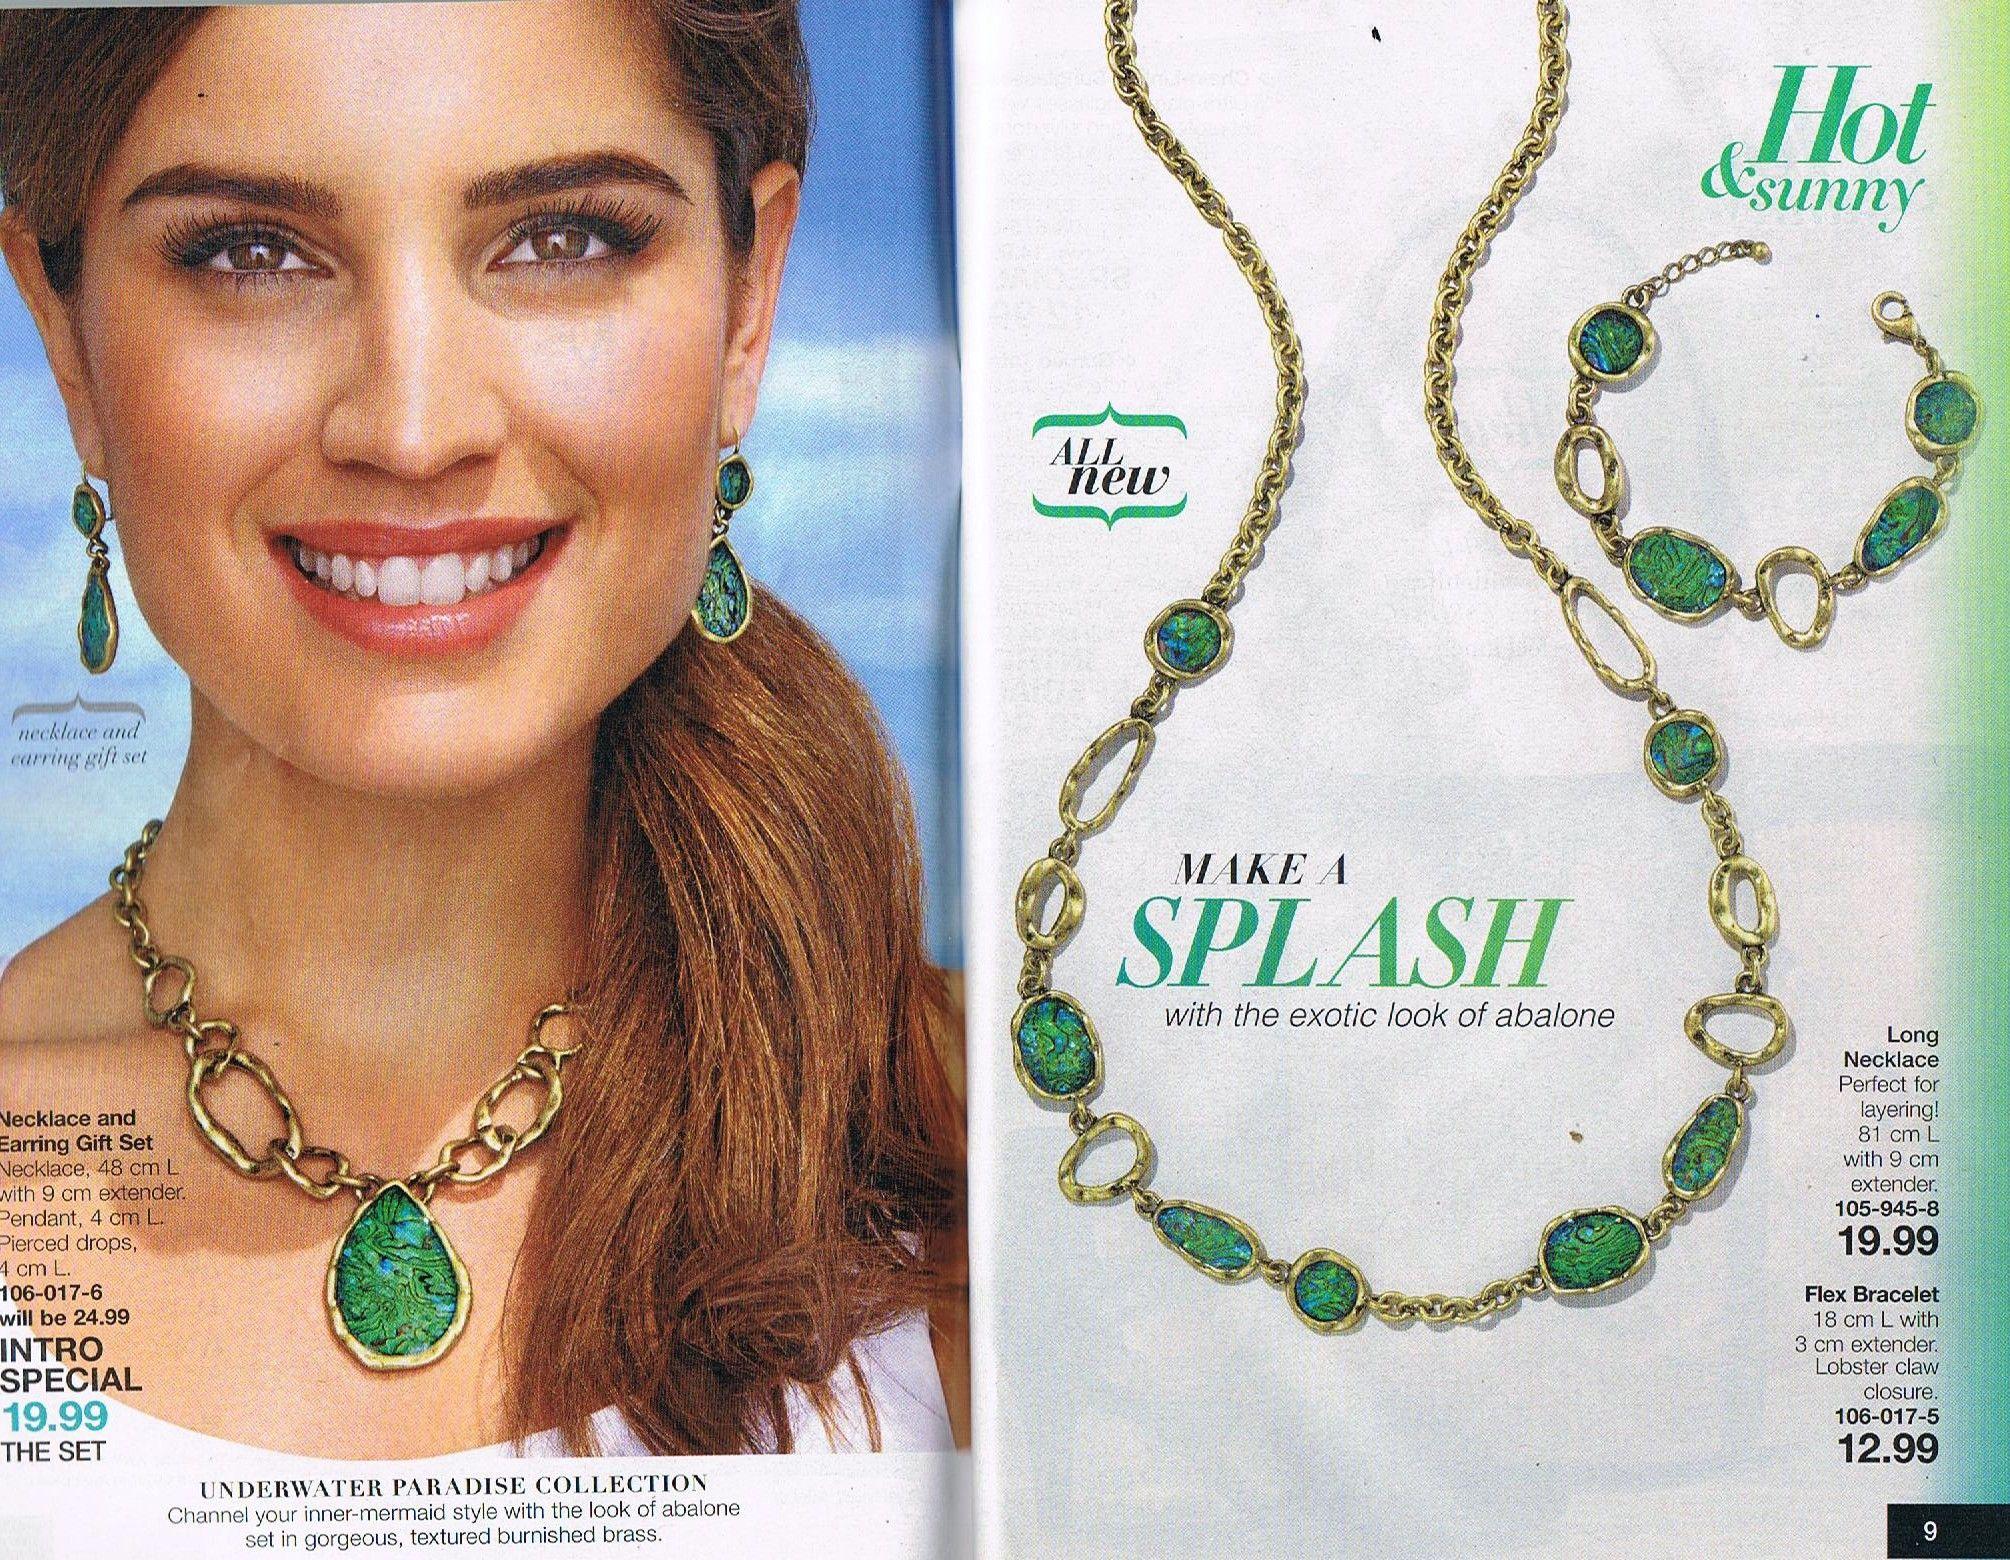 Make a splash turquoise necklace pendants earrings